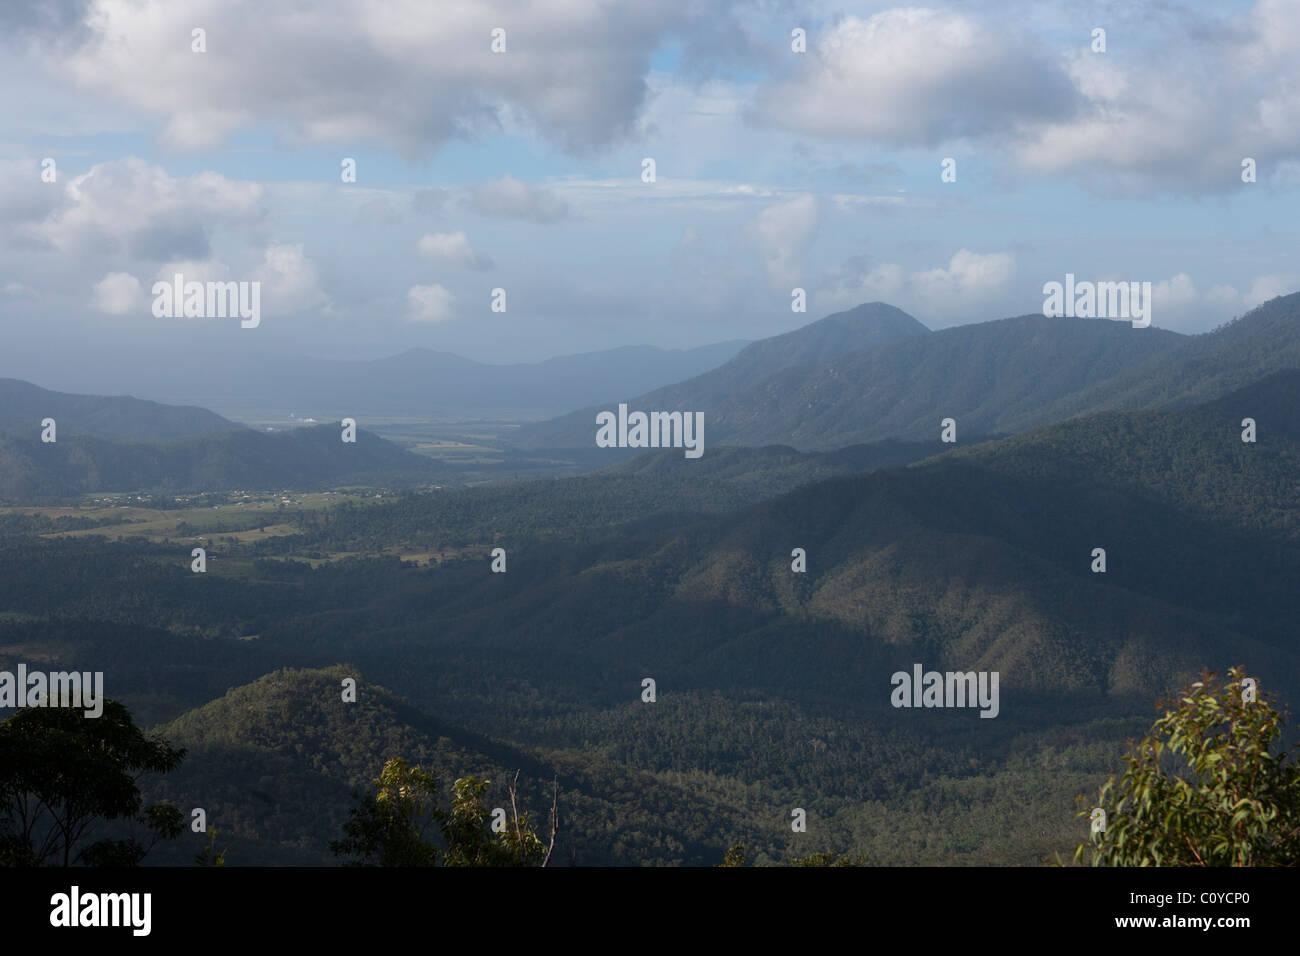 Eucalyptus gum forests. Queensland Tablelands. - Stock Image